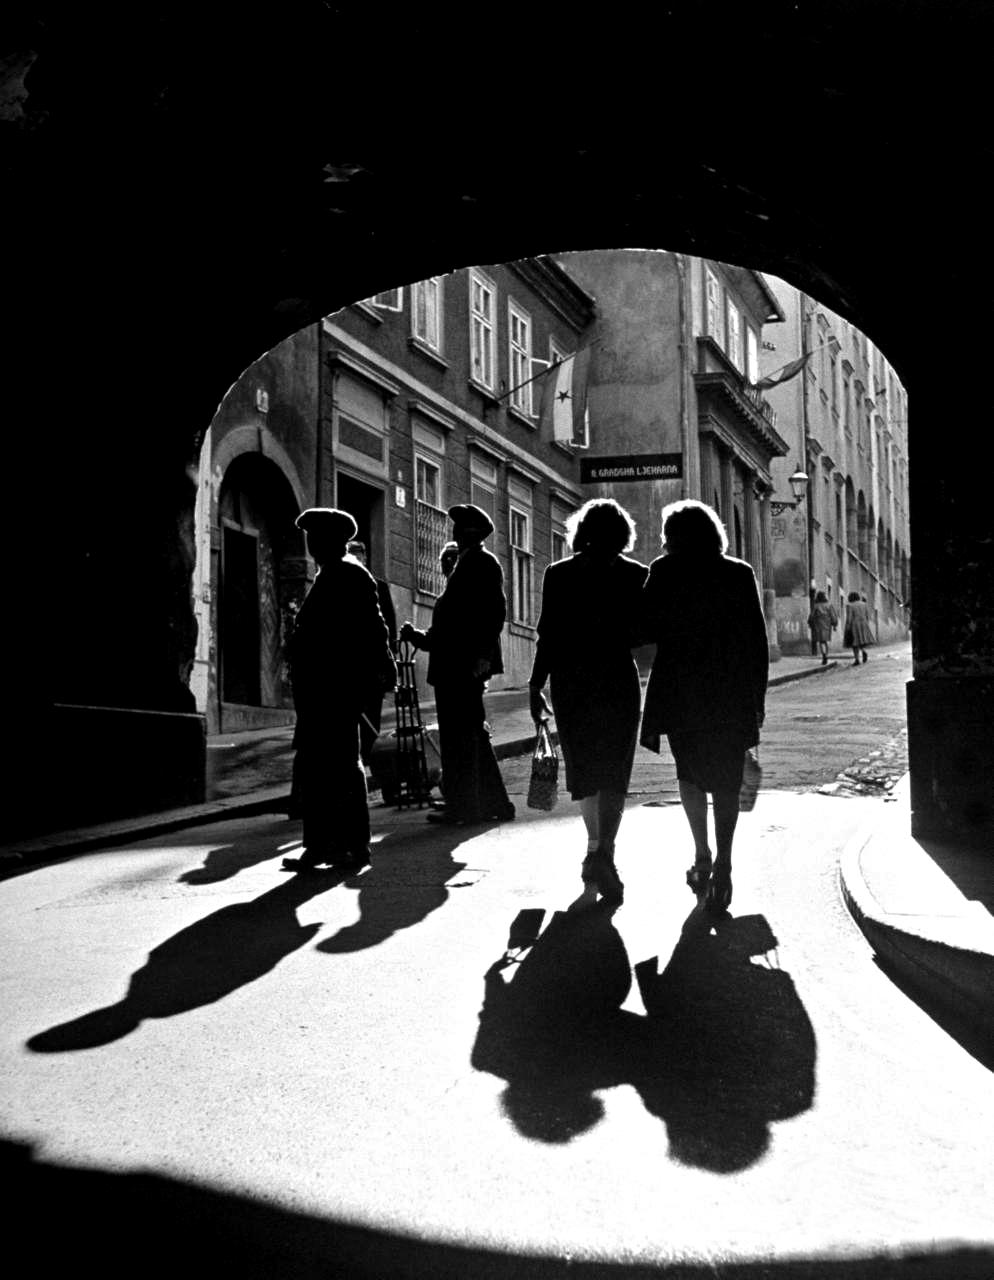 Walter Sanders People Walking Through A Dark Tunnel Zagreb Yugoslavia 1948 Photography Black And White Photographs Photo